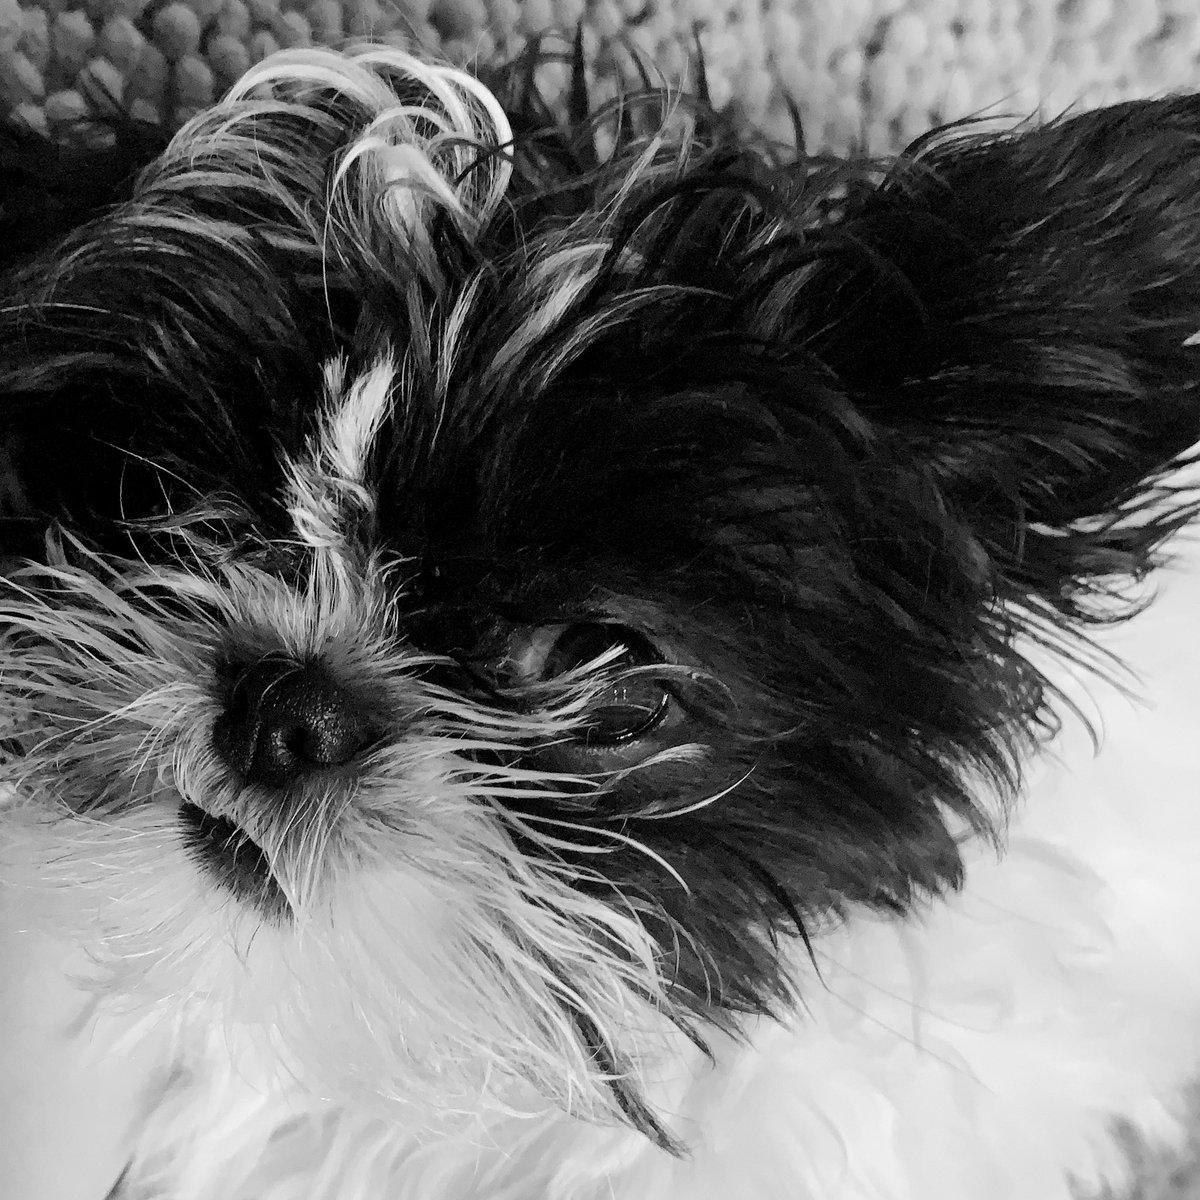 GiGi wanted a black & white portrait ❤️